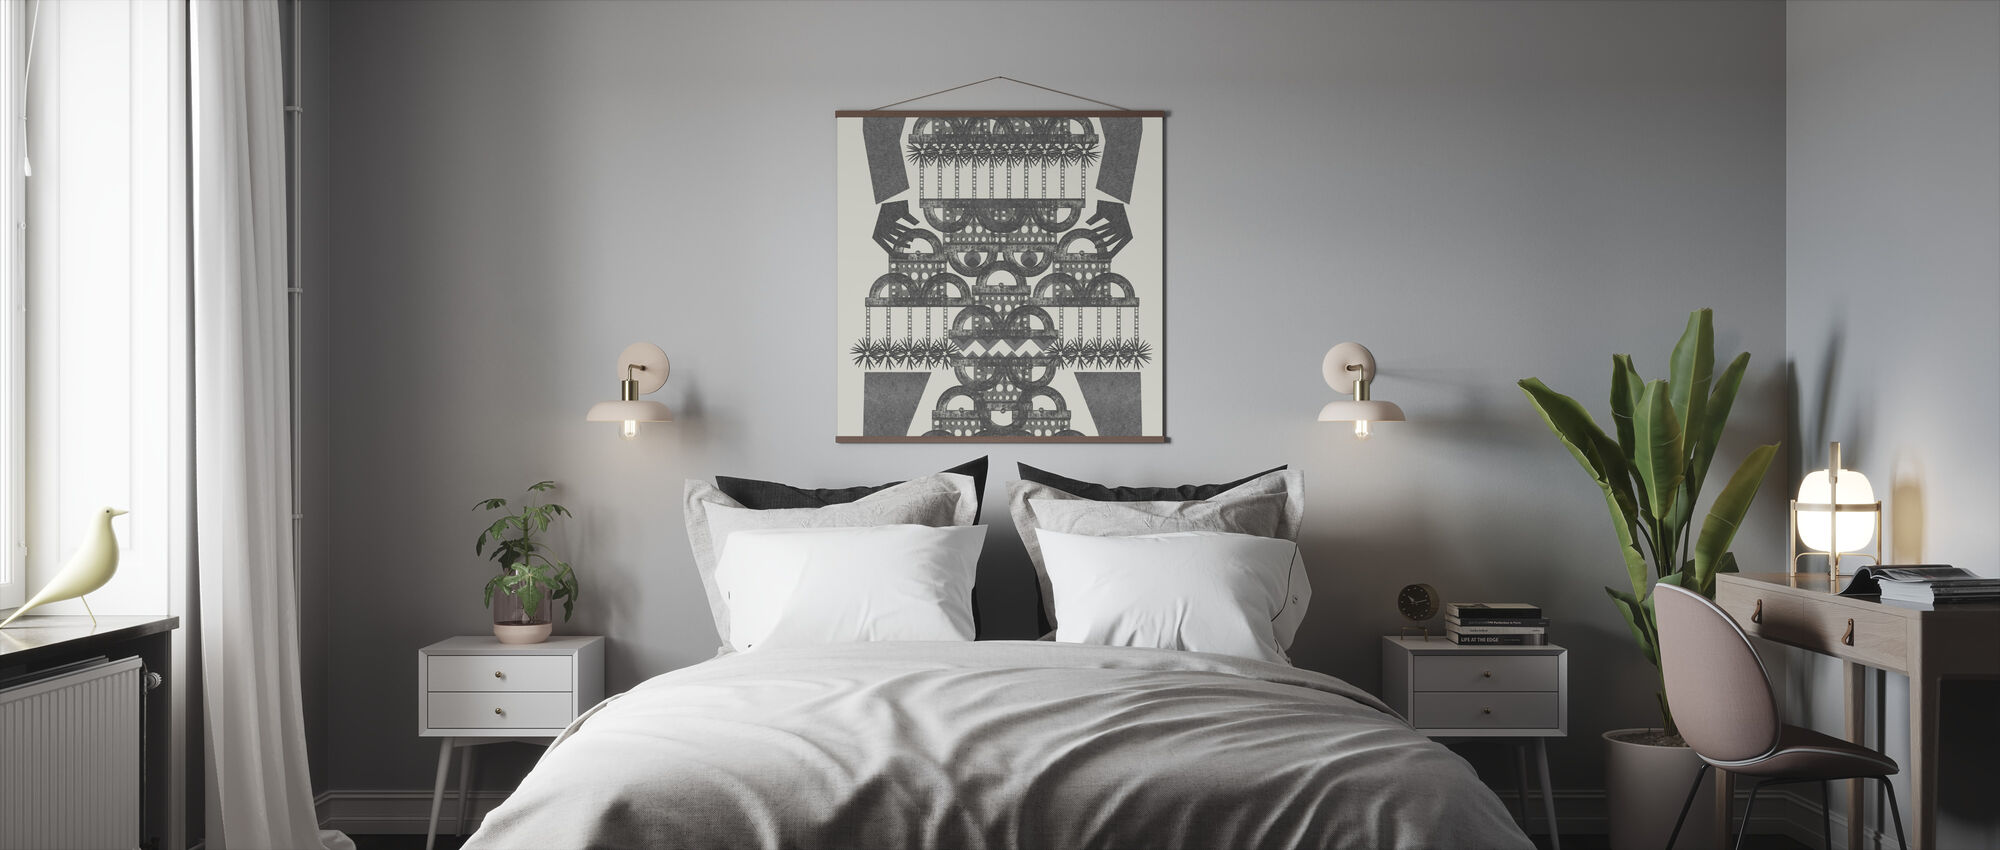 Toteemi - Juliste - Makuuhuone